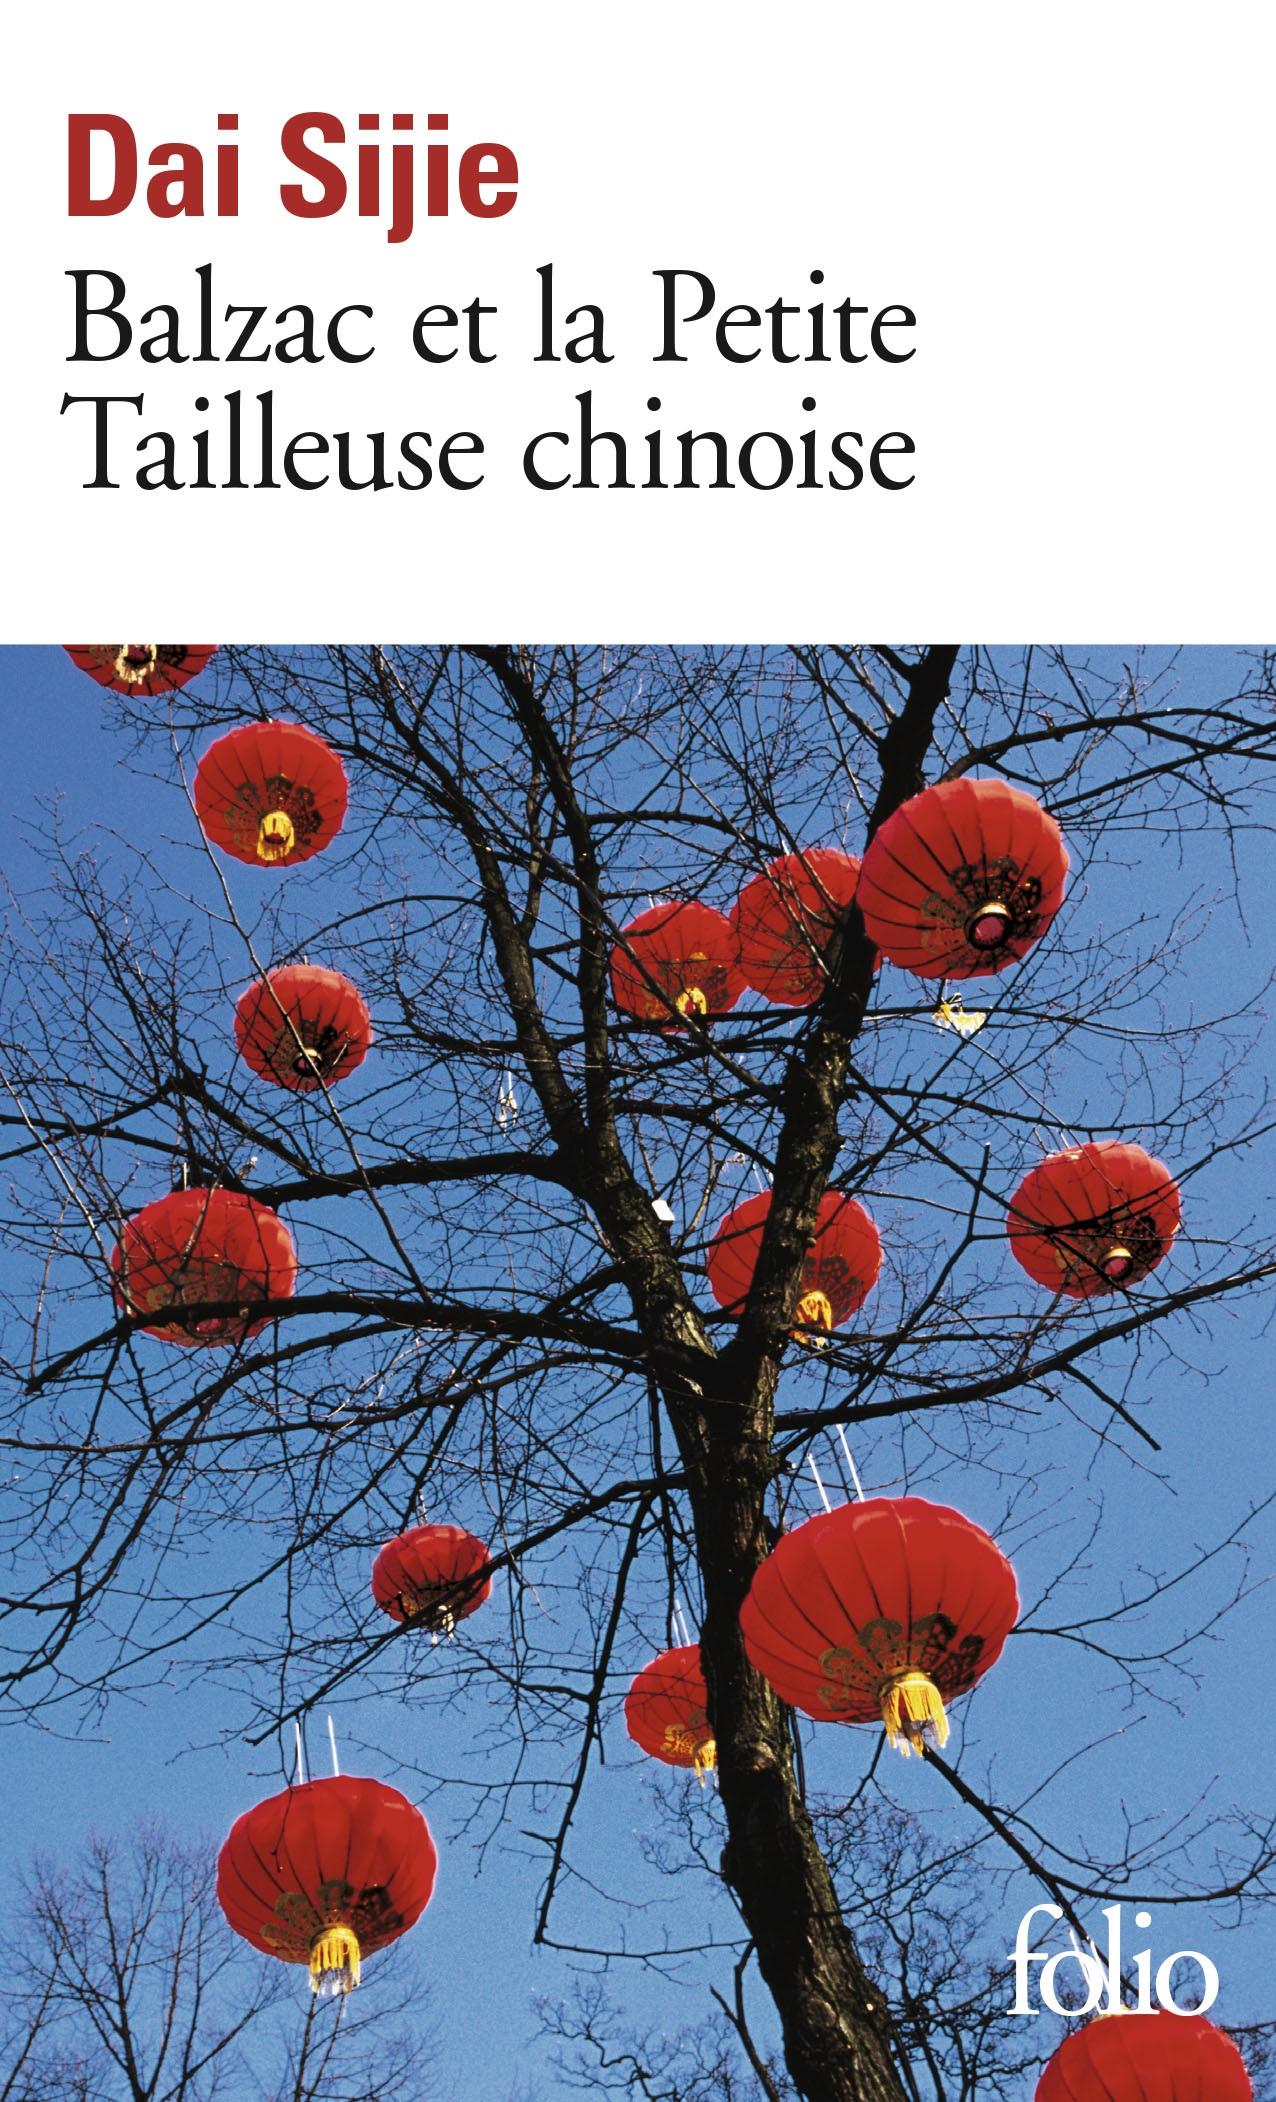 Balzac et la Petite Tailleuse chinoise | Dai Sijie,